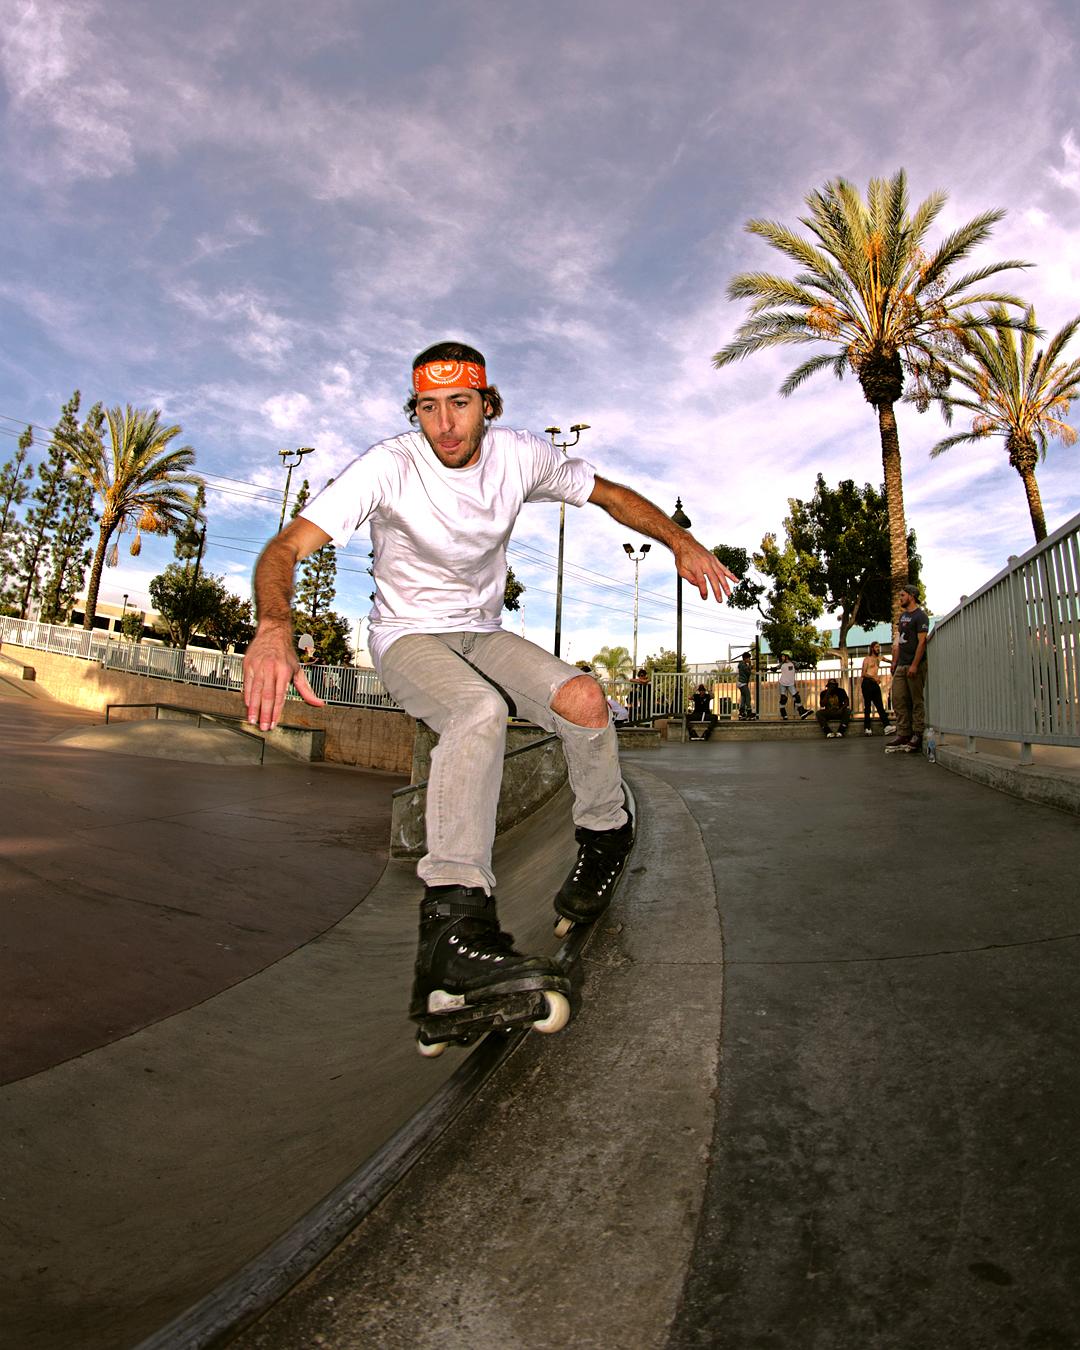 Matt lacing a soul grind at the skatepark.